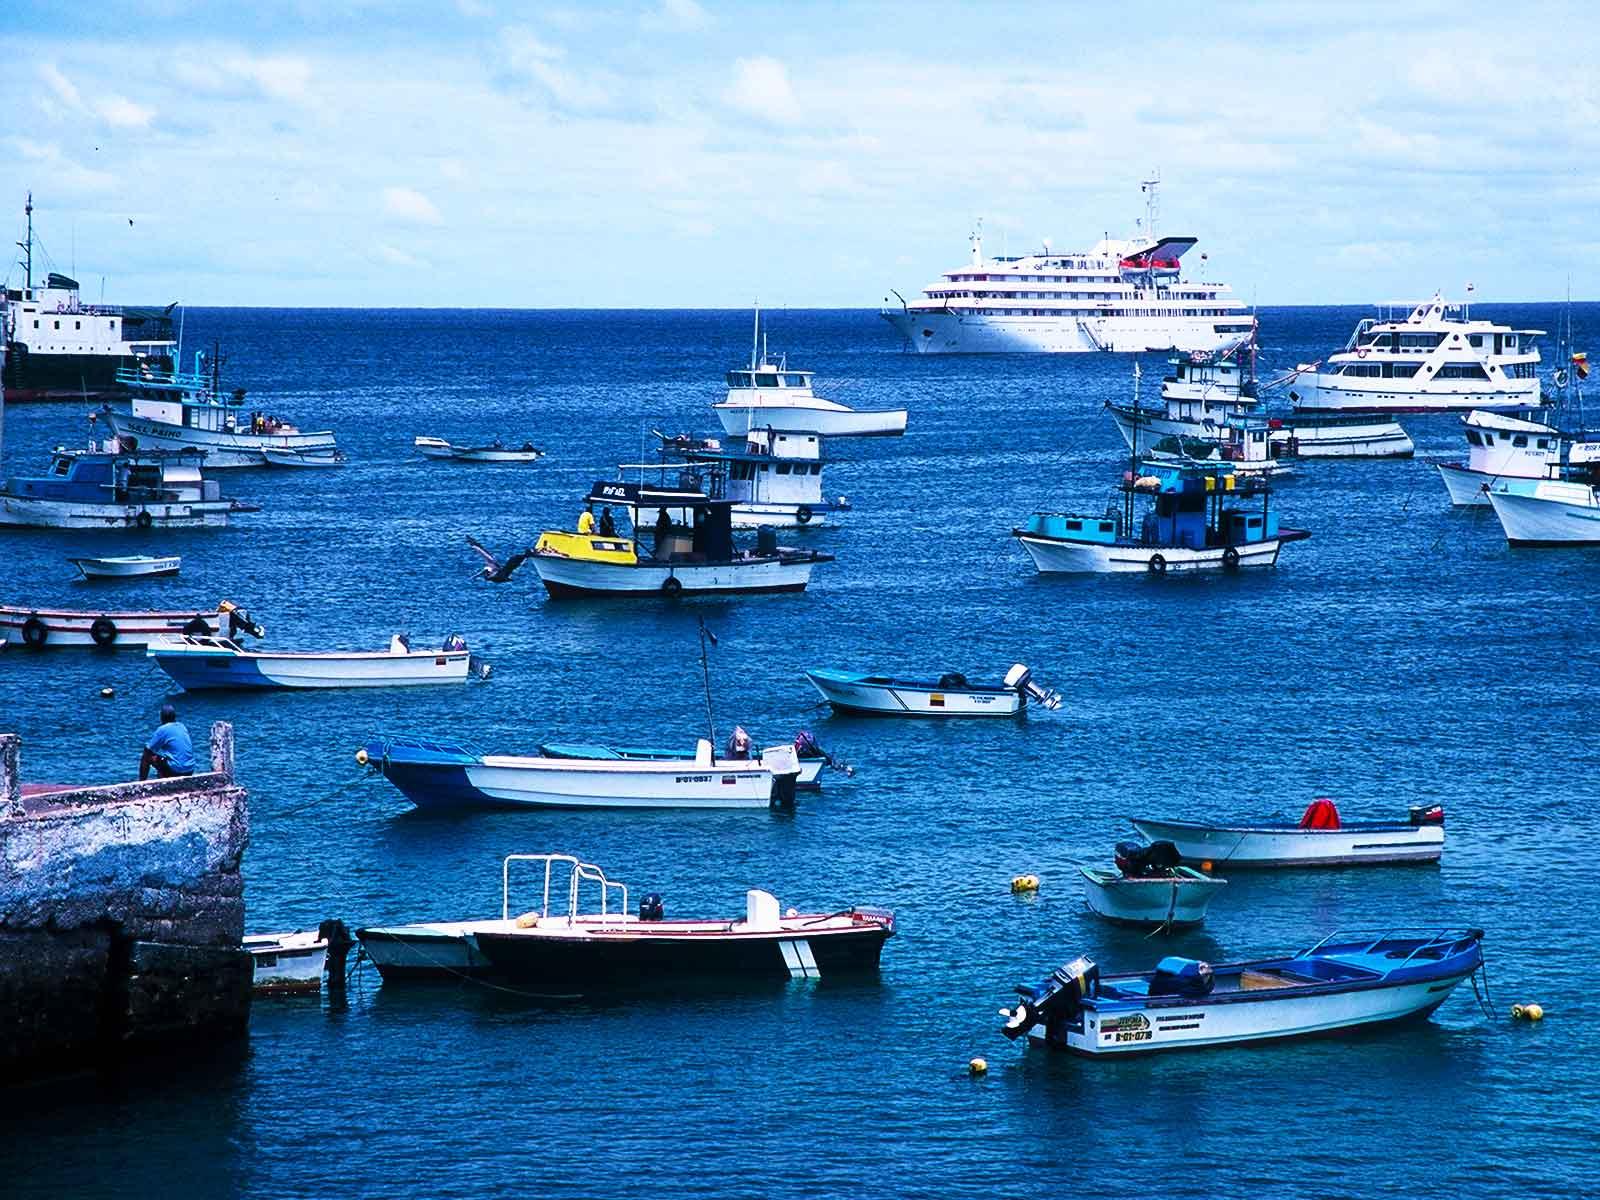 Puerto Baquerizo Moreno - San Cristobal - Galapagos - Steven Martin - Learning Adventures - Study Abroad Journal